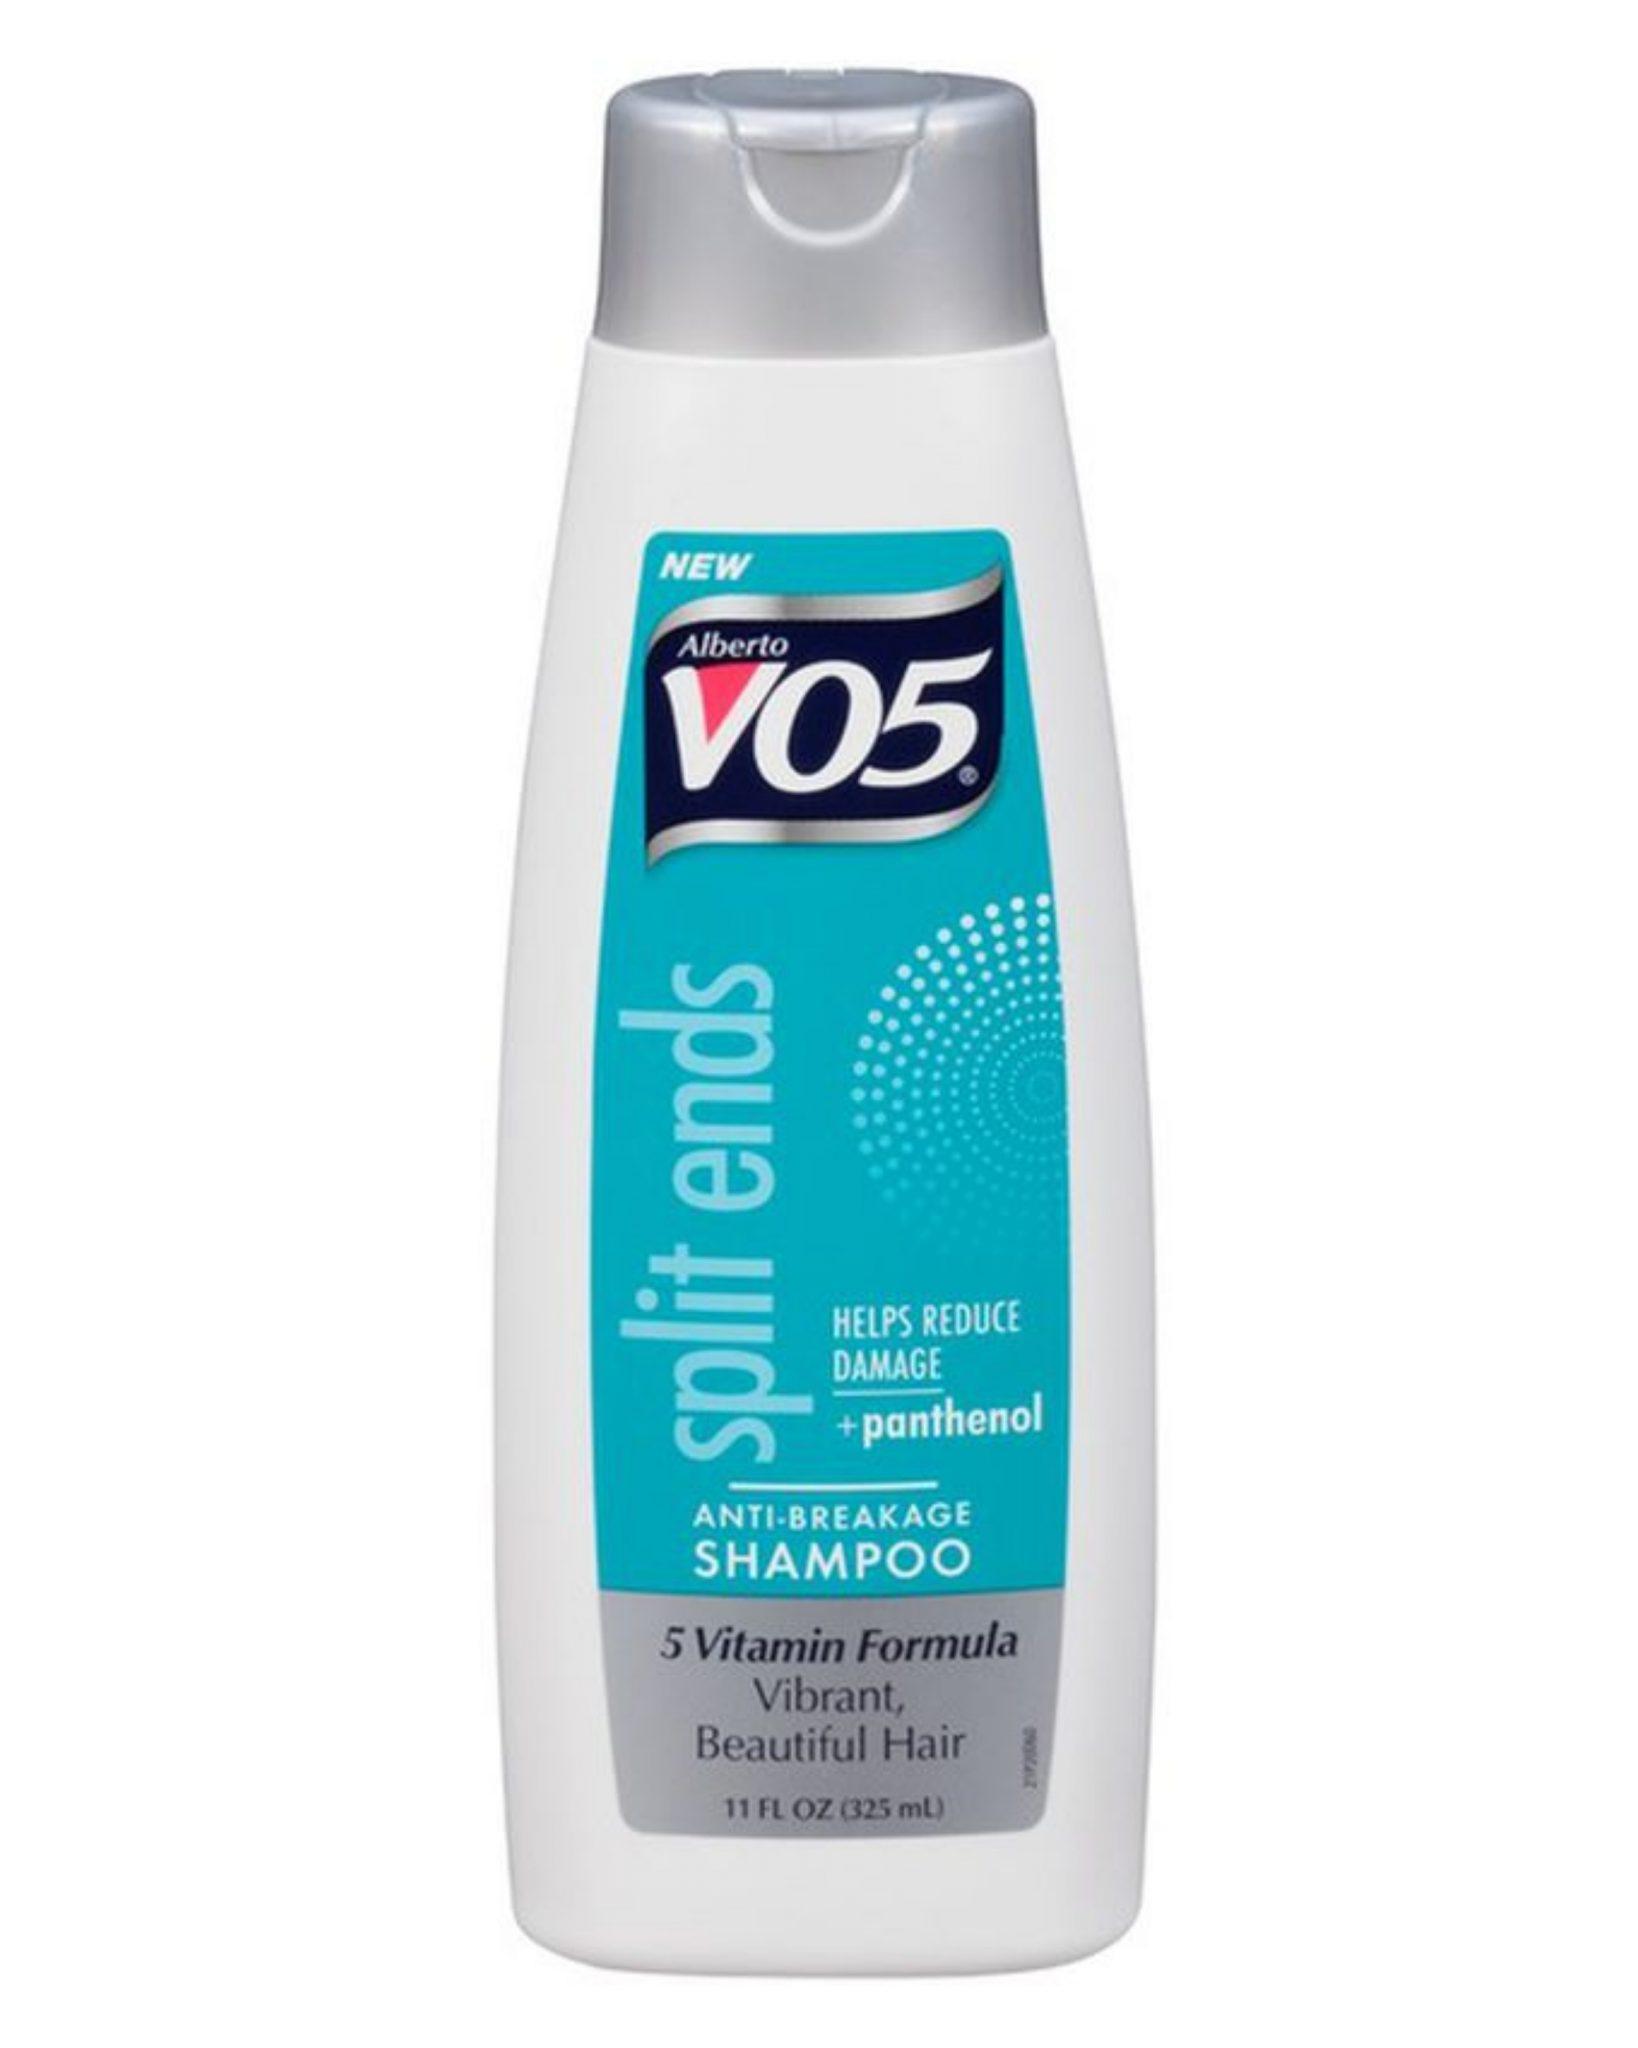 Alberto VO5 Split Ends Anti-breakage Shampoo 12.5Oz